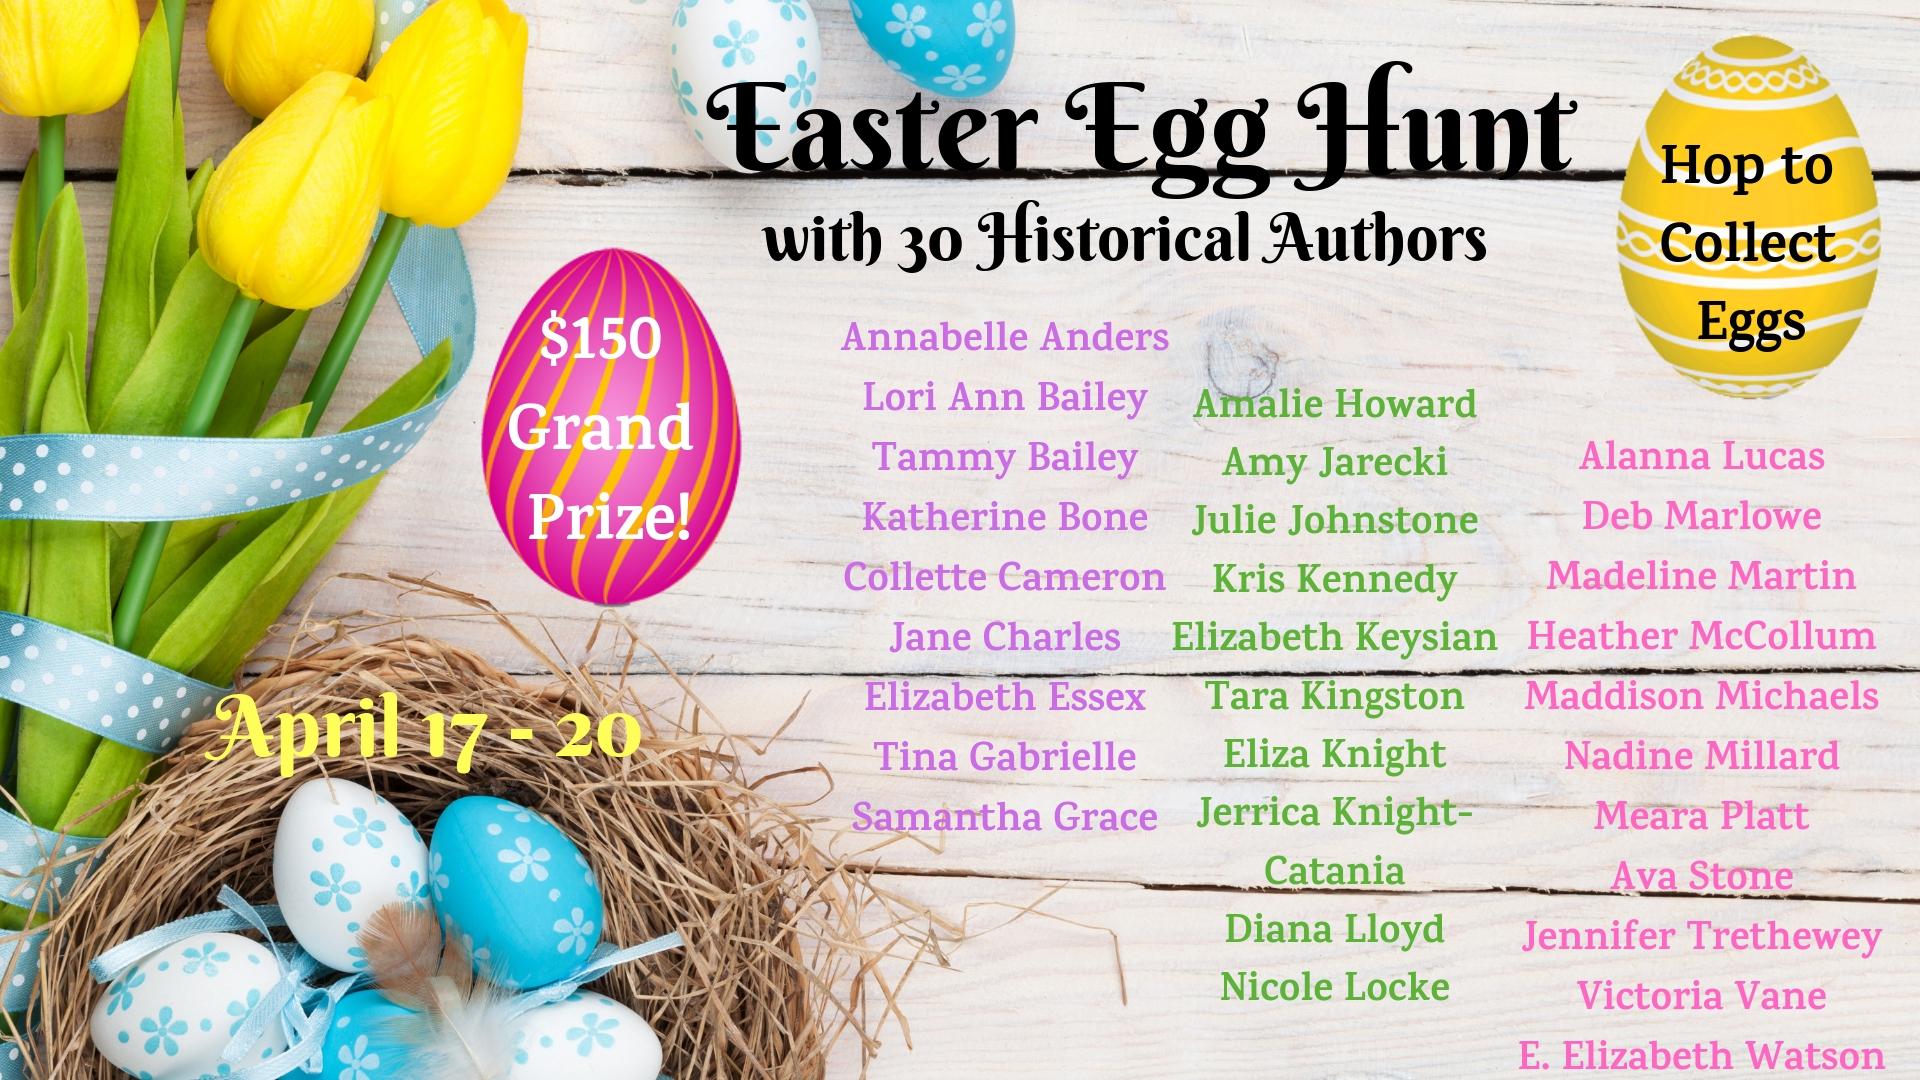 Historical Author Easter Egg Hunt